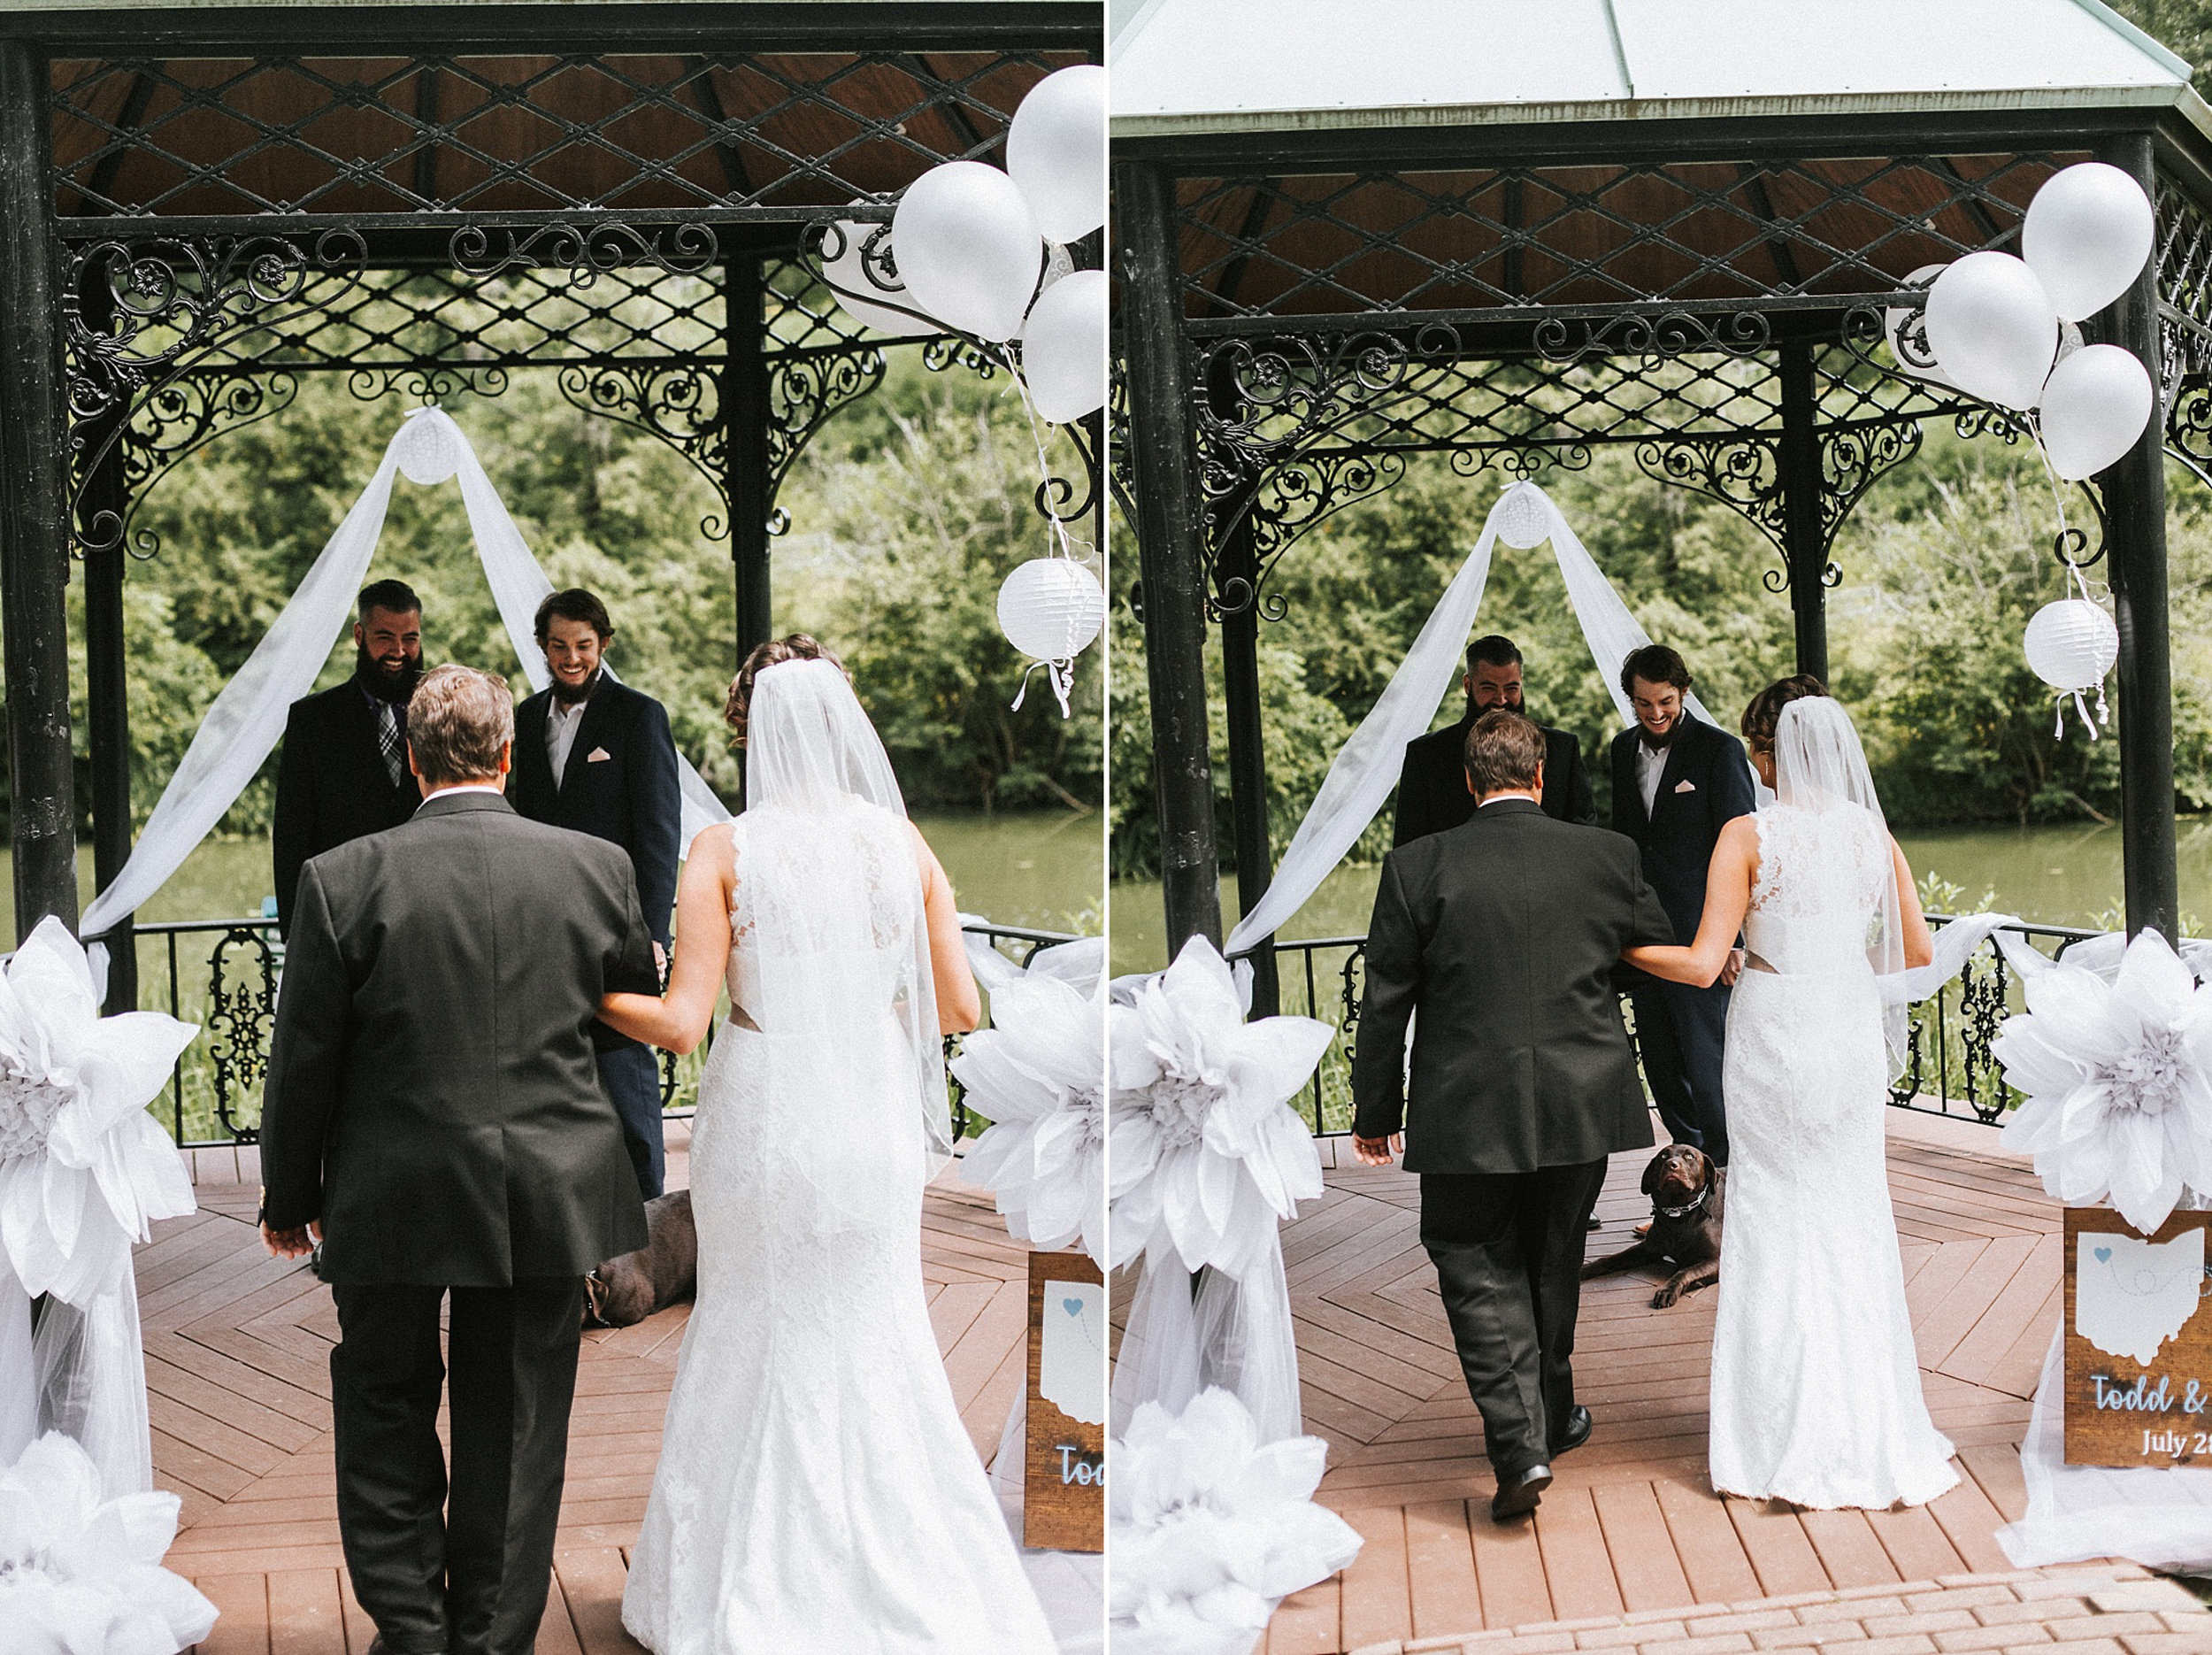 Brooke Townsend Photography - Ohio Wedding Photographer (54 of 78).jpg